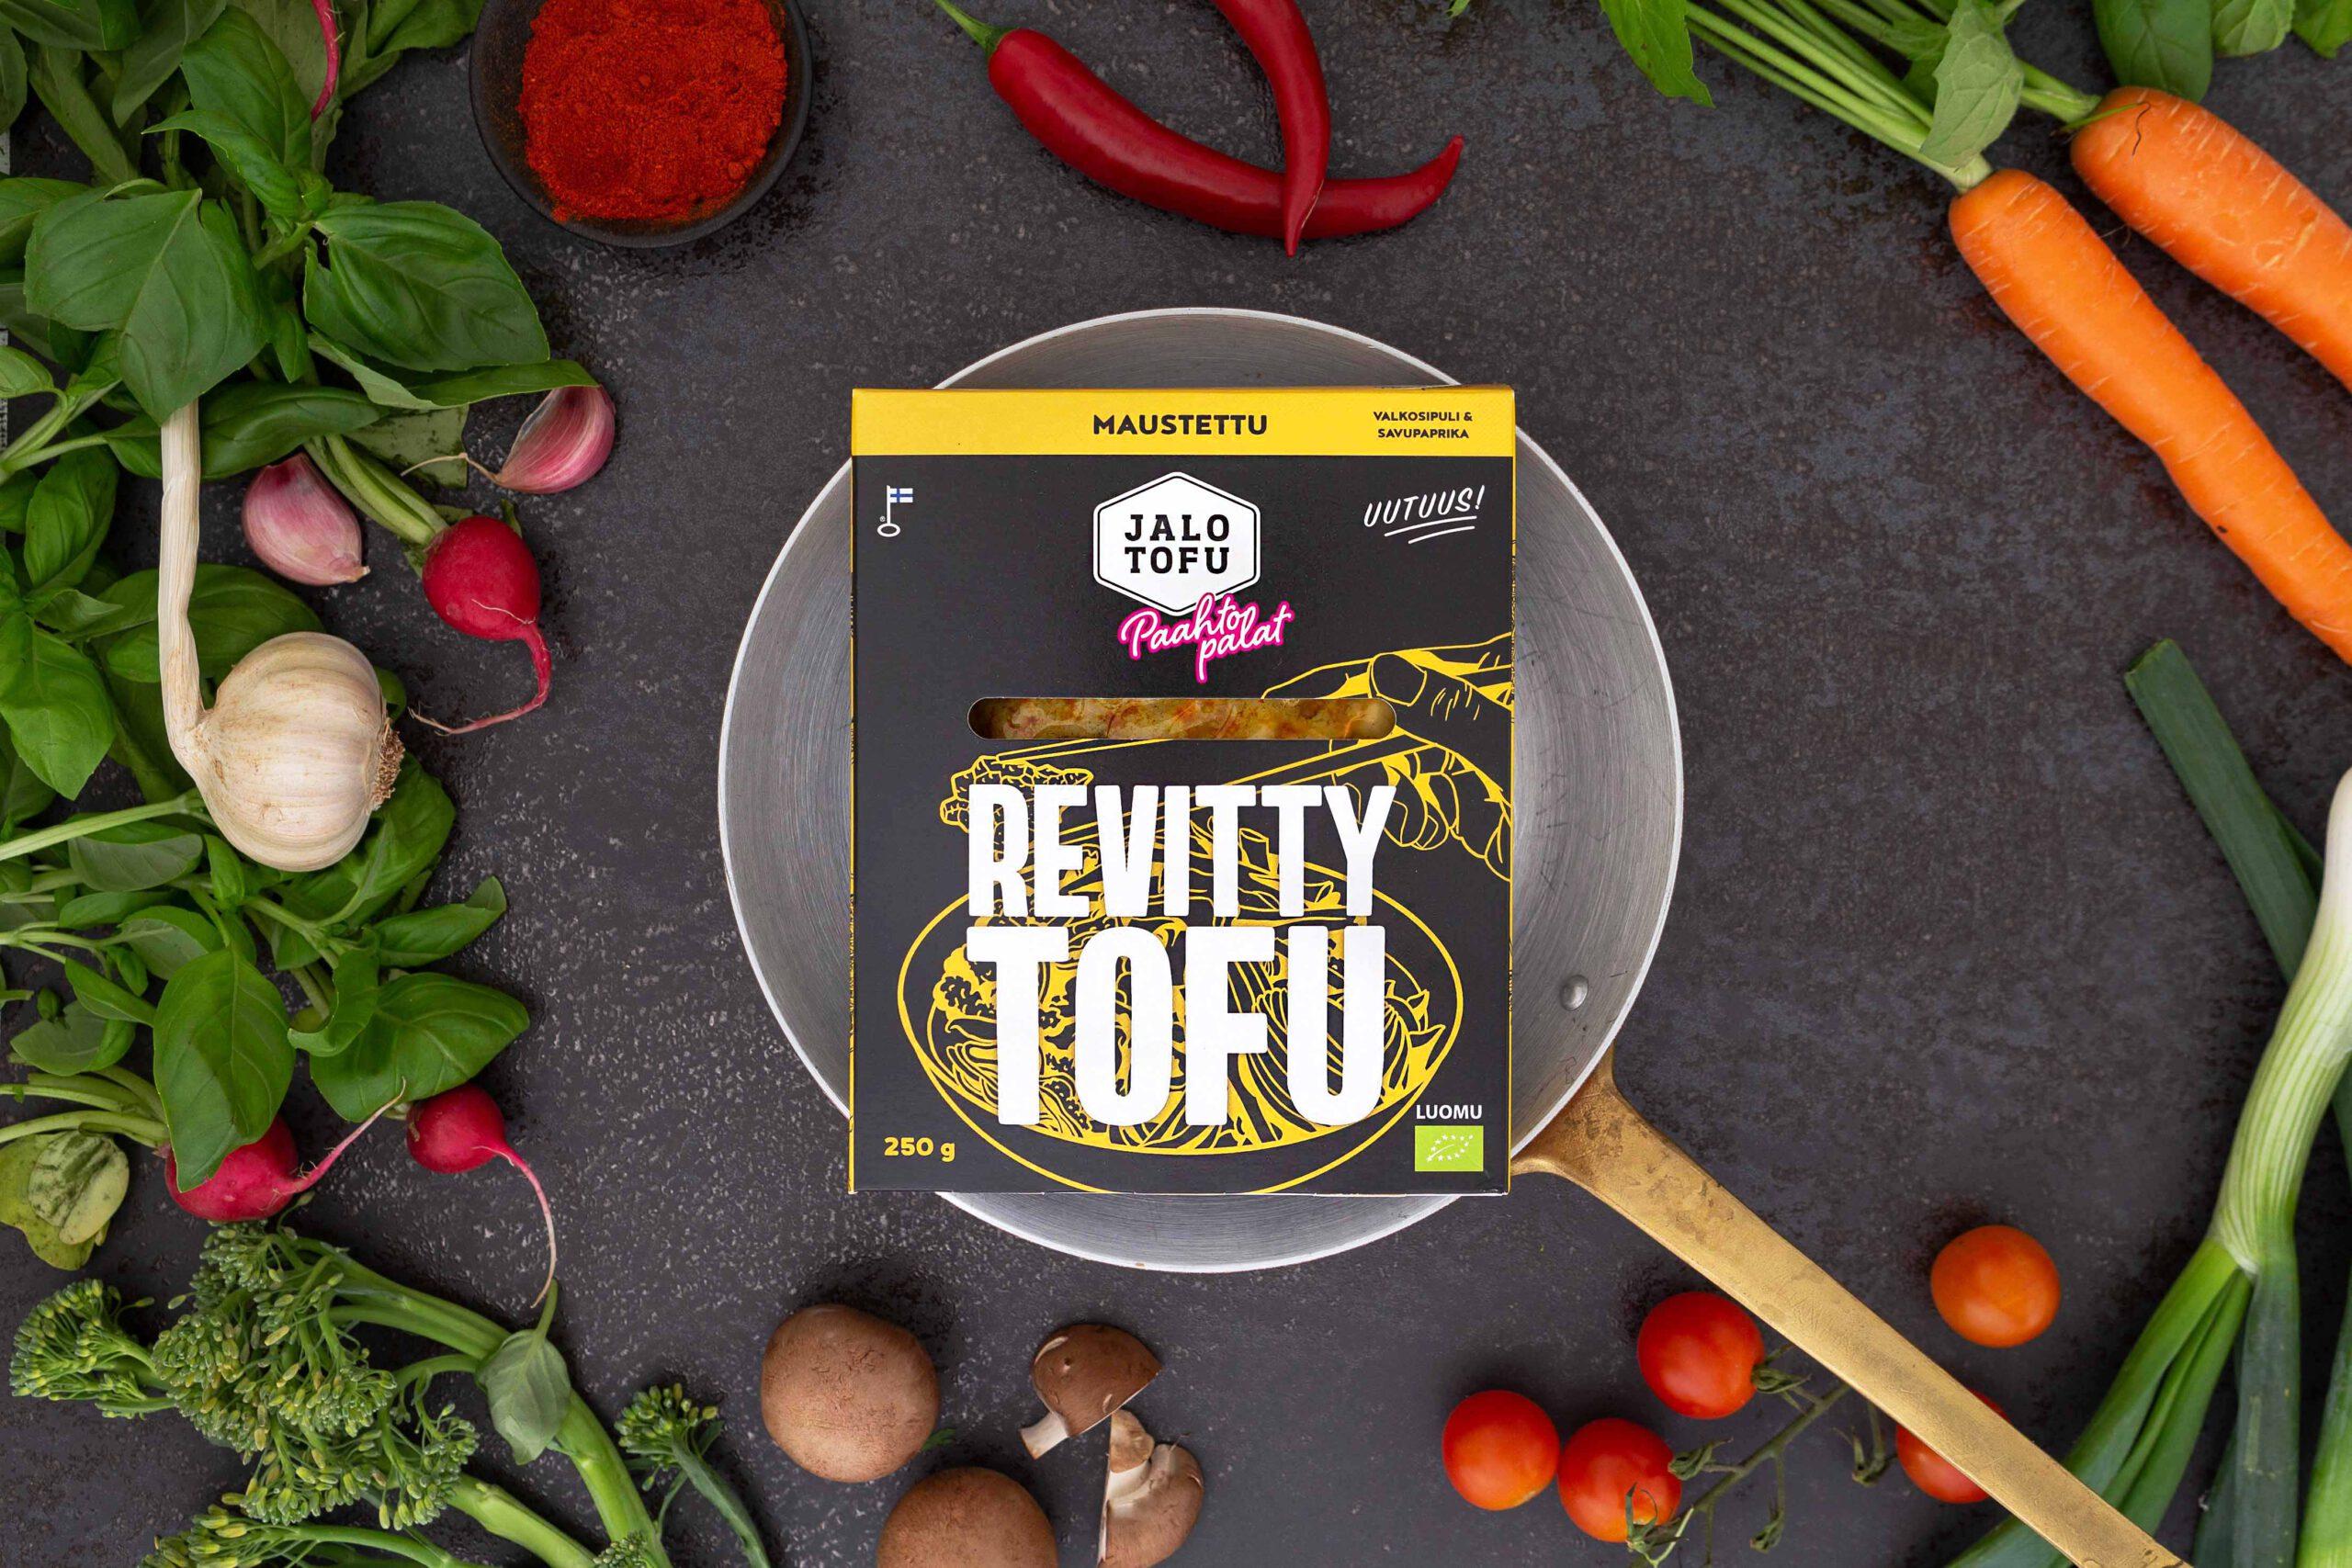 uuutus tofu tuote kasviproteiini